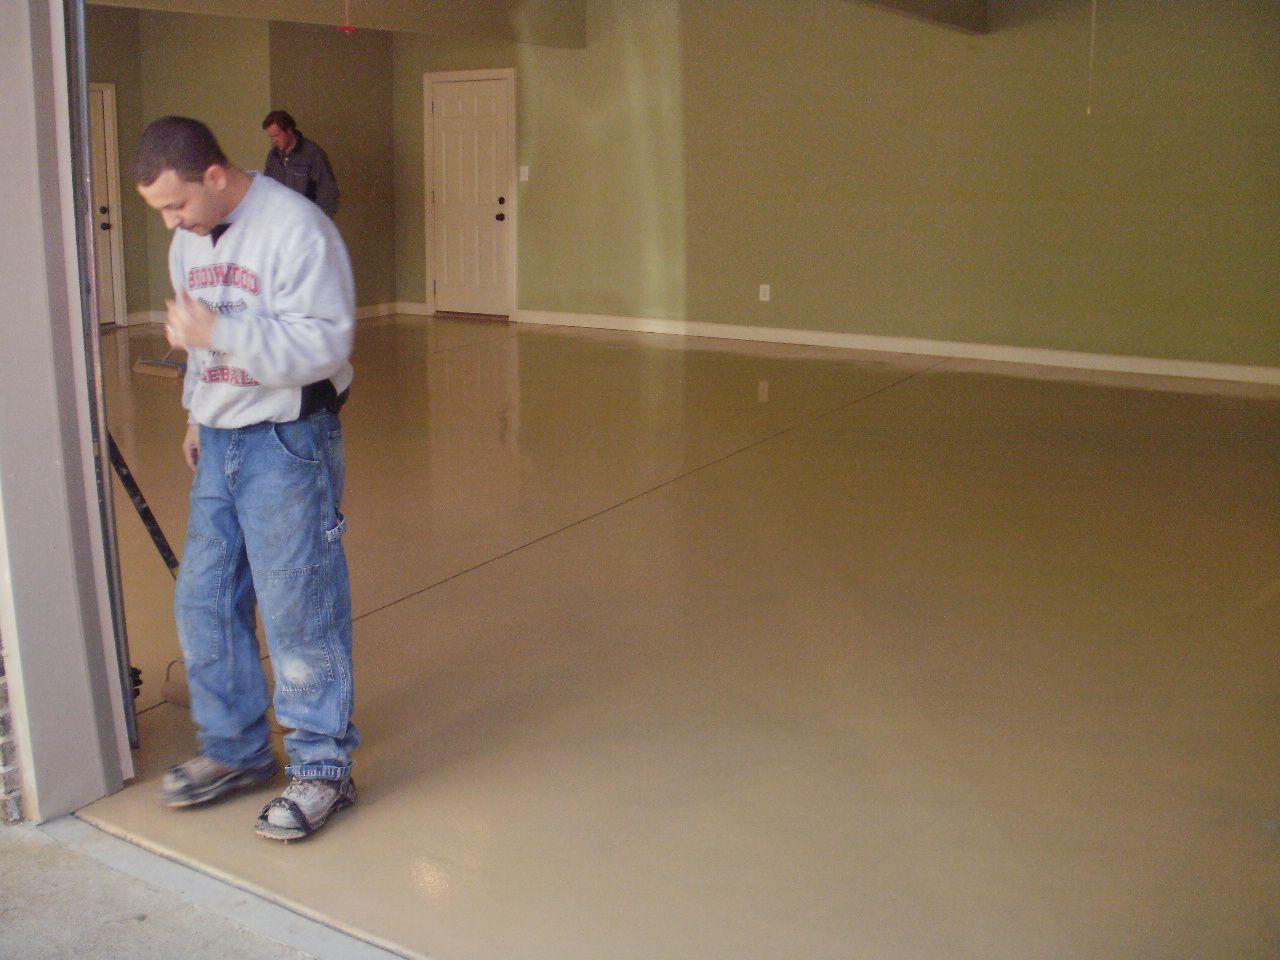 Delightful Garage Floor Epoxy/coating/paint   LotusTalk   The Lotus Cars Community